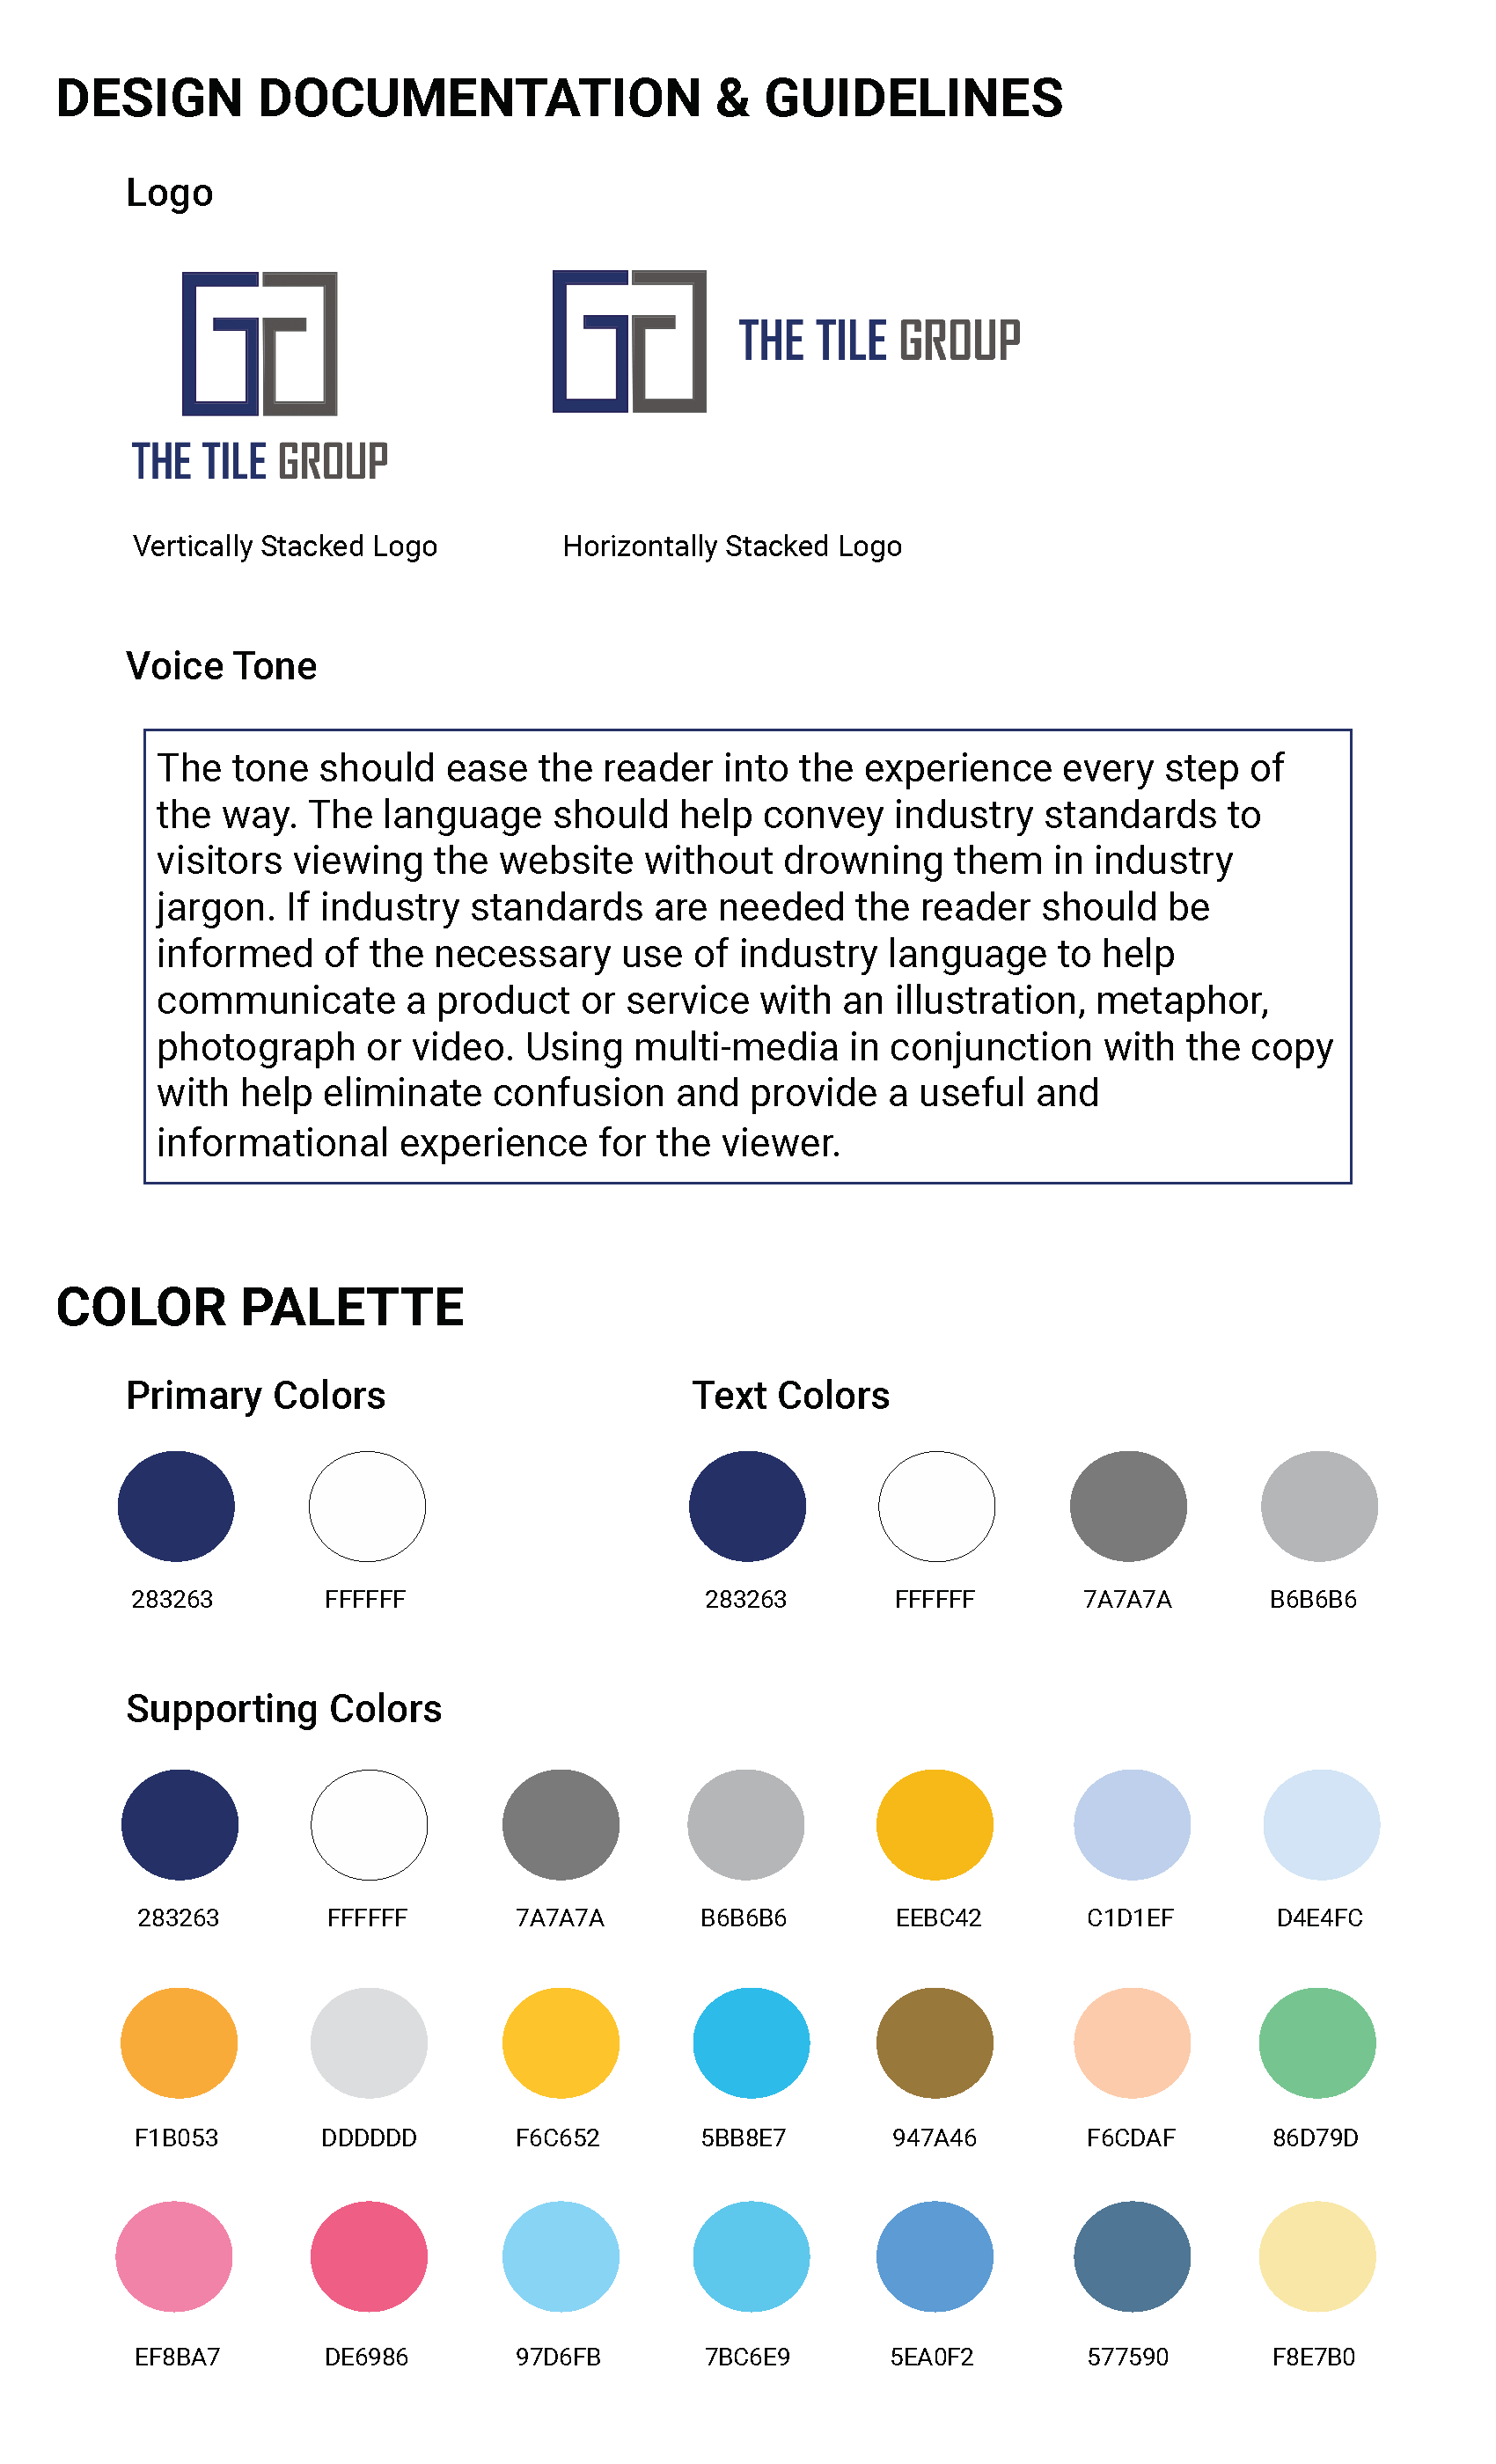 Design Documentations image 1 of 5